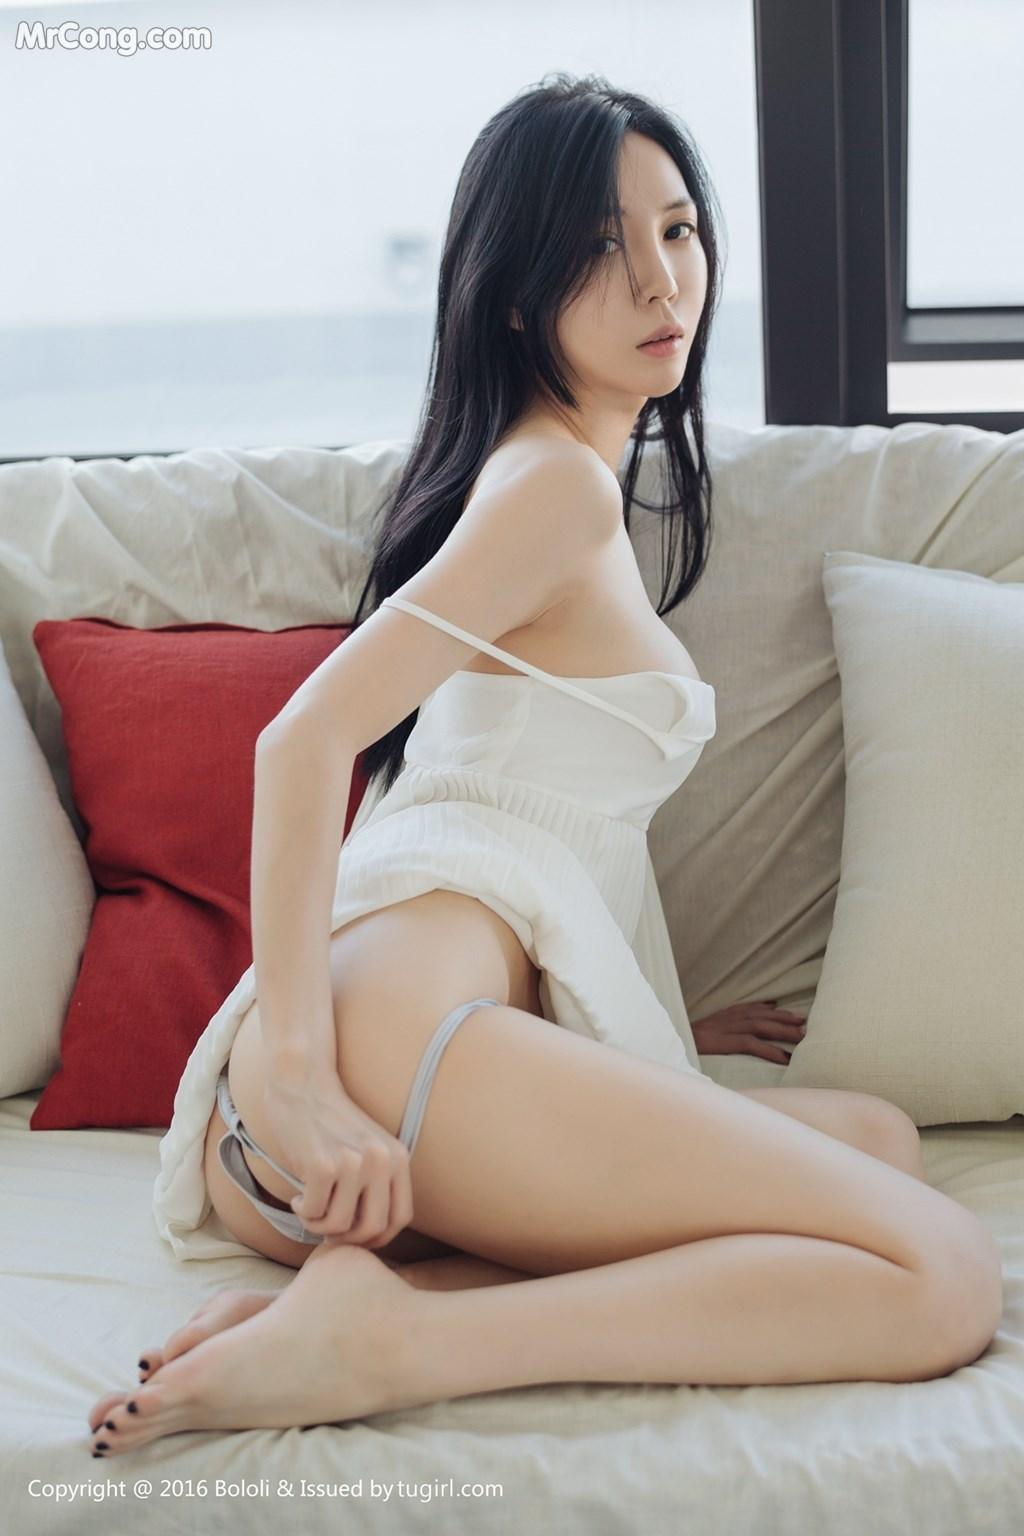 Image BoLoli-2017-09-17-Vol.118-Bebe-Kim-MrCong.com-014 in post BoLoli 2017-09-17 Vol.118: Người mẫu Bebe_Kim (48 ảnh)